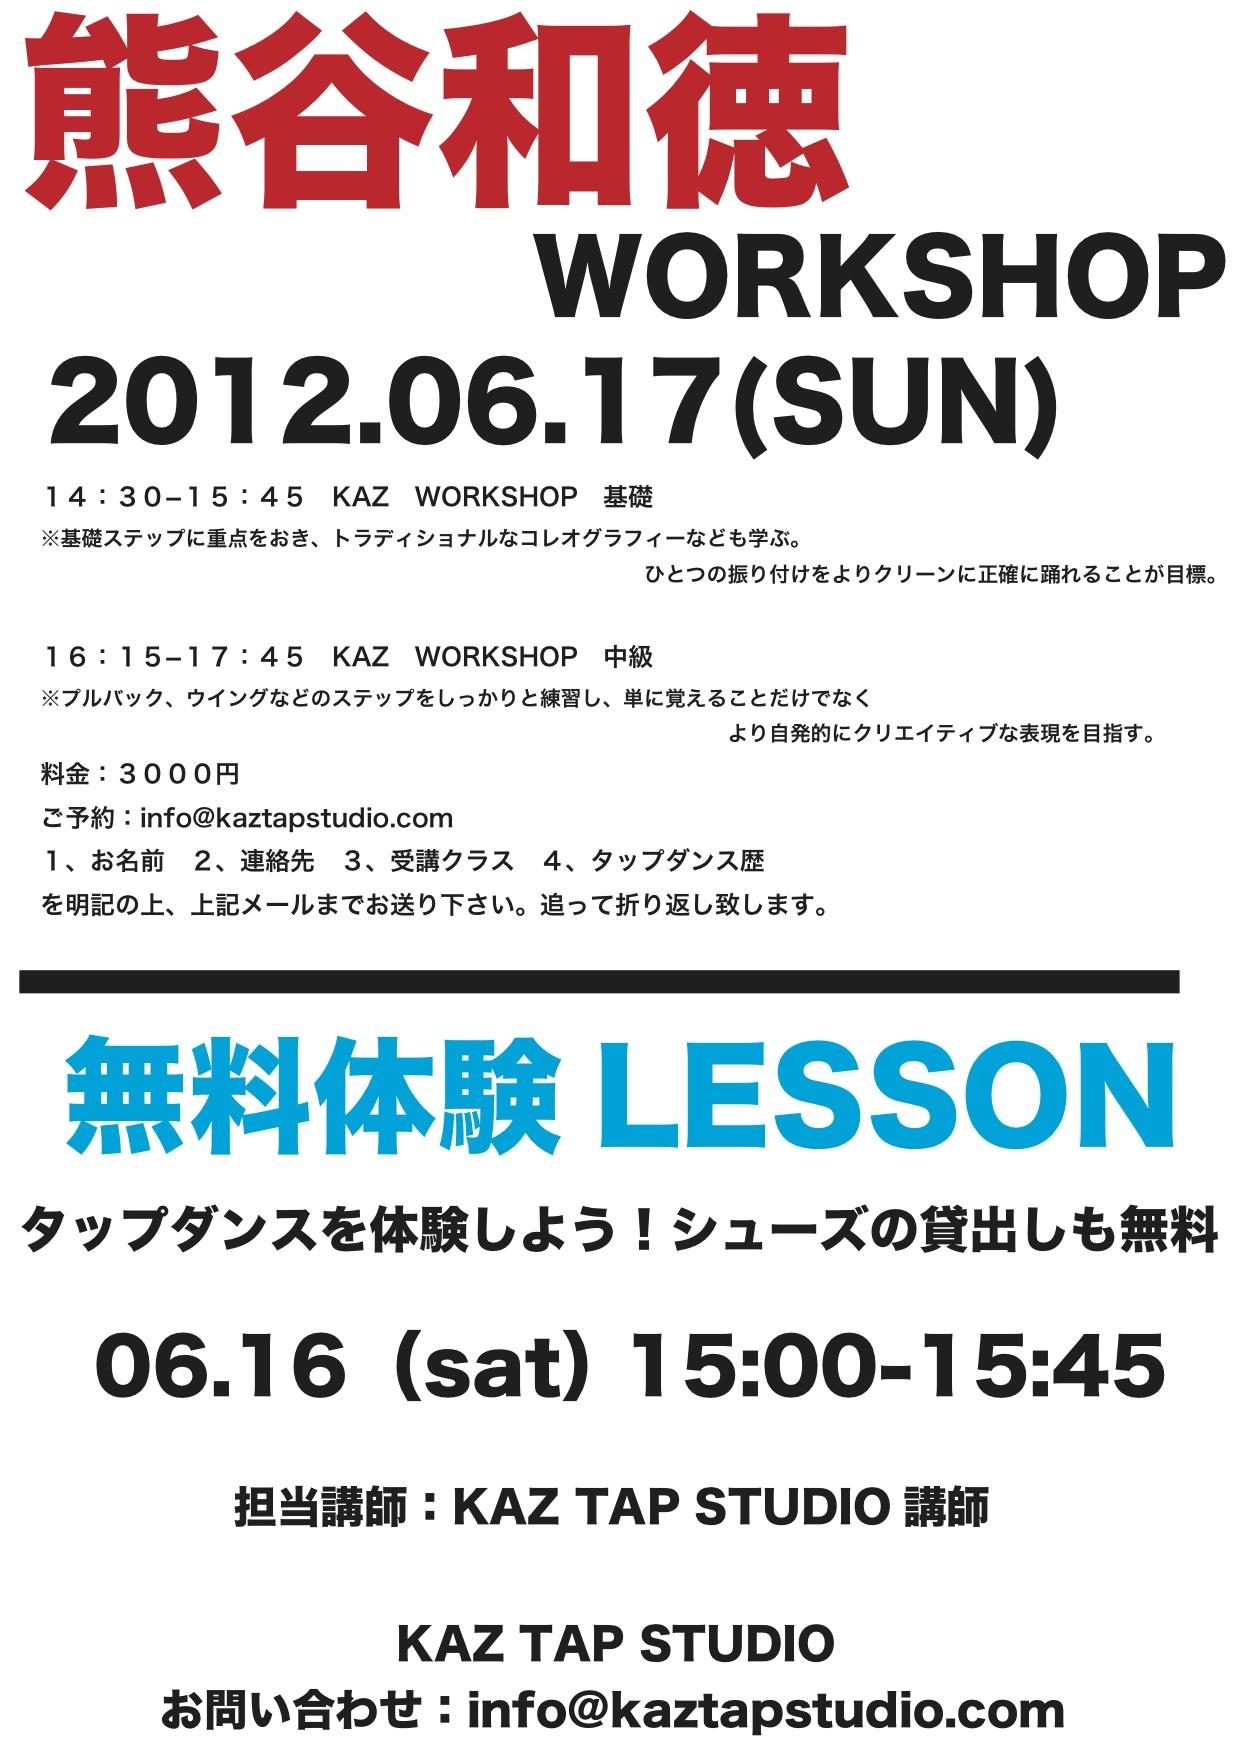 KISEKI WEEKのお知らせ(workshop&写真展)_f0137346_0433334.jpg